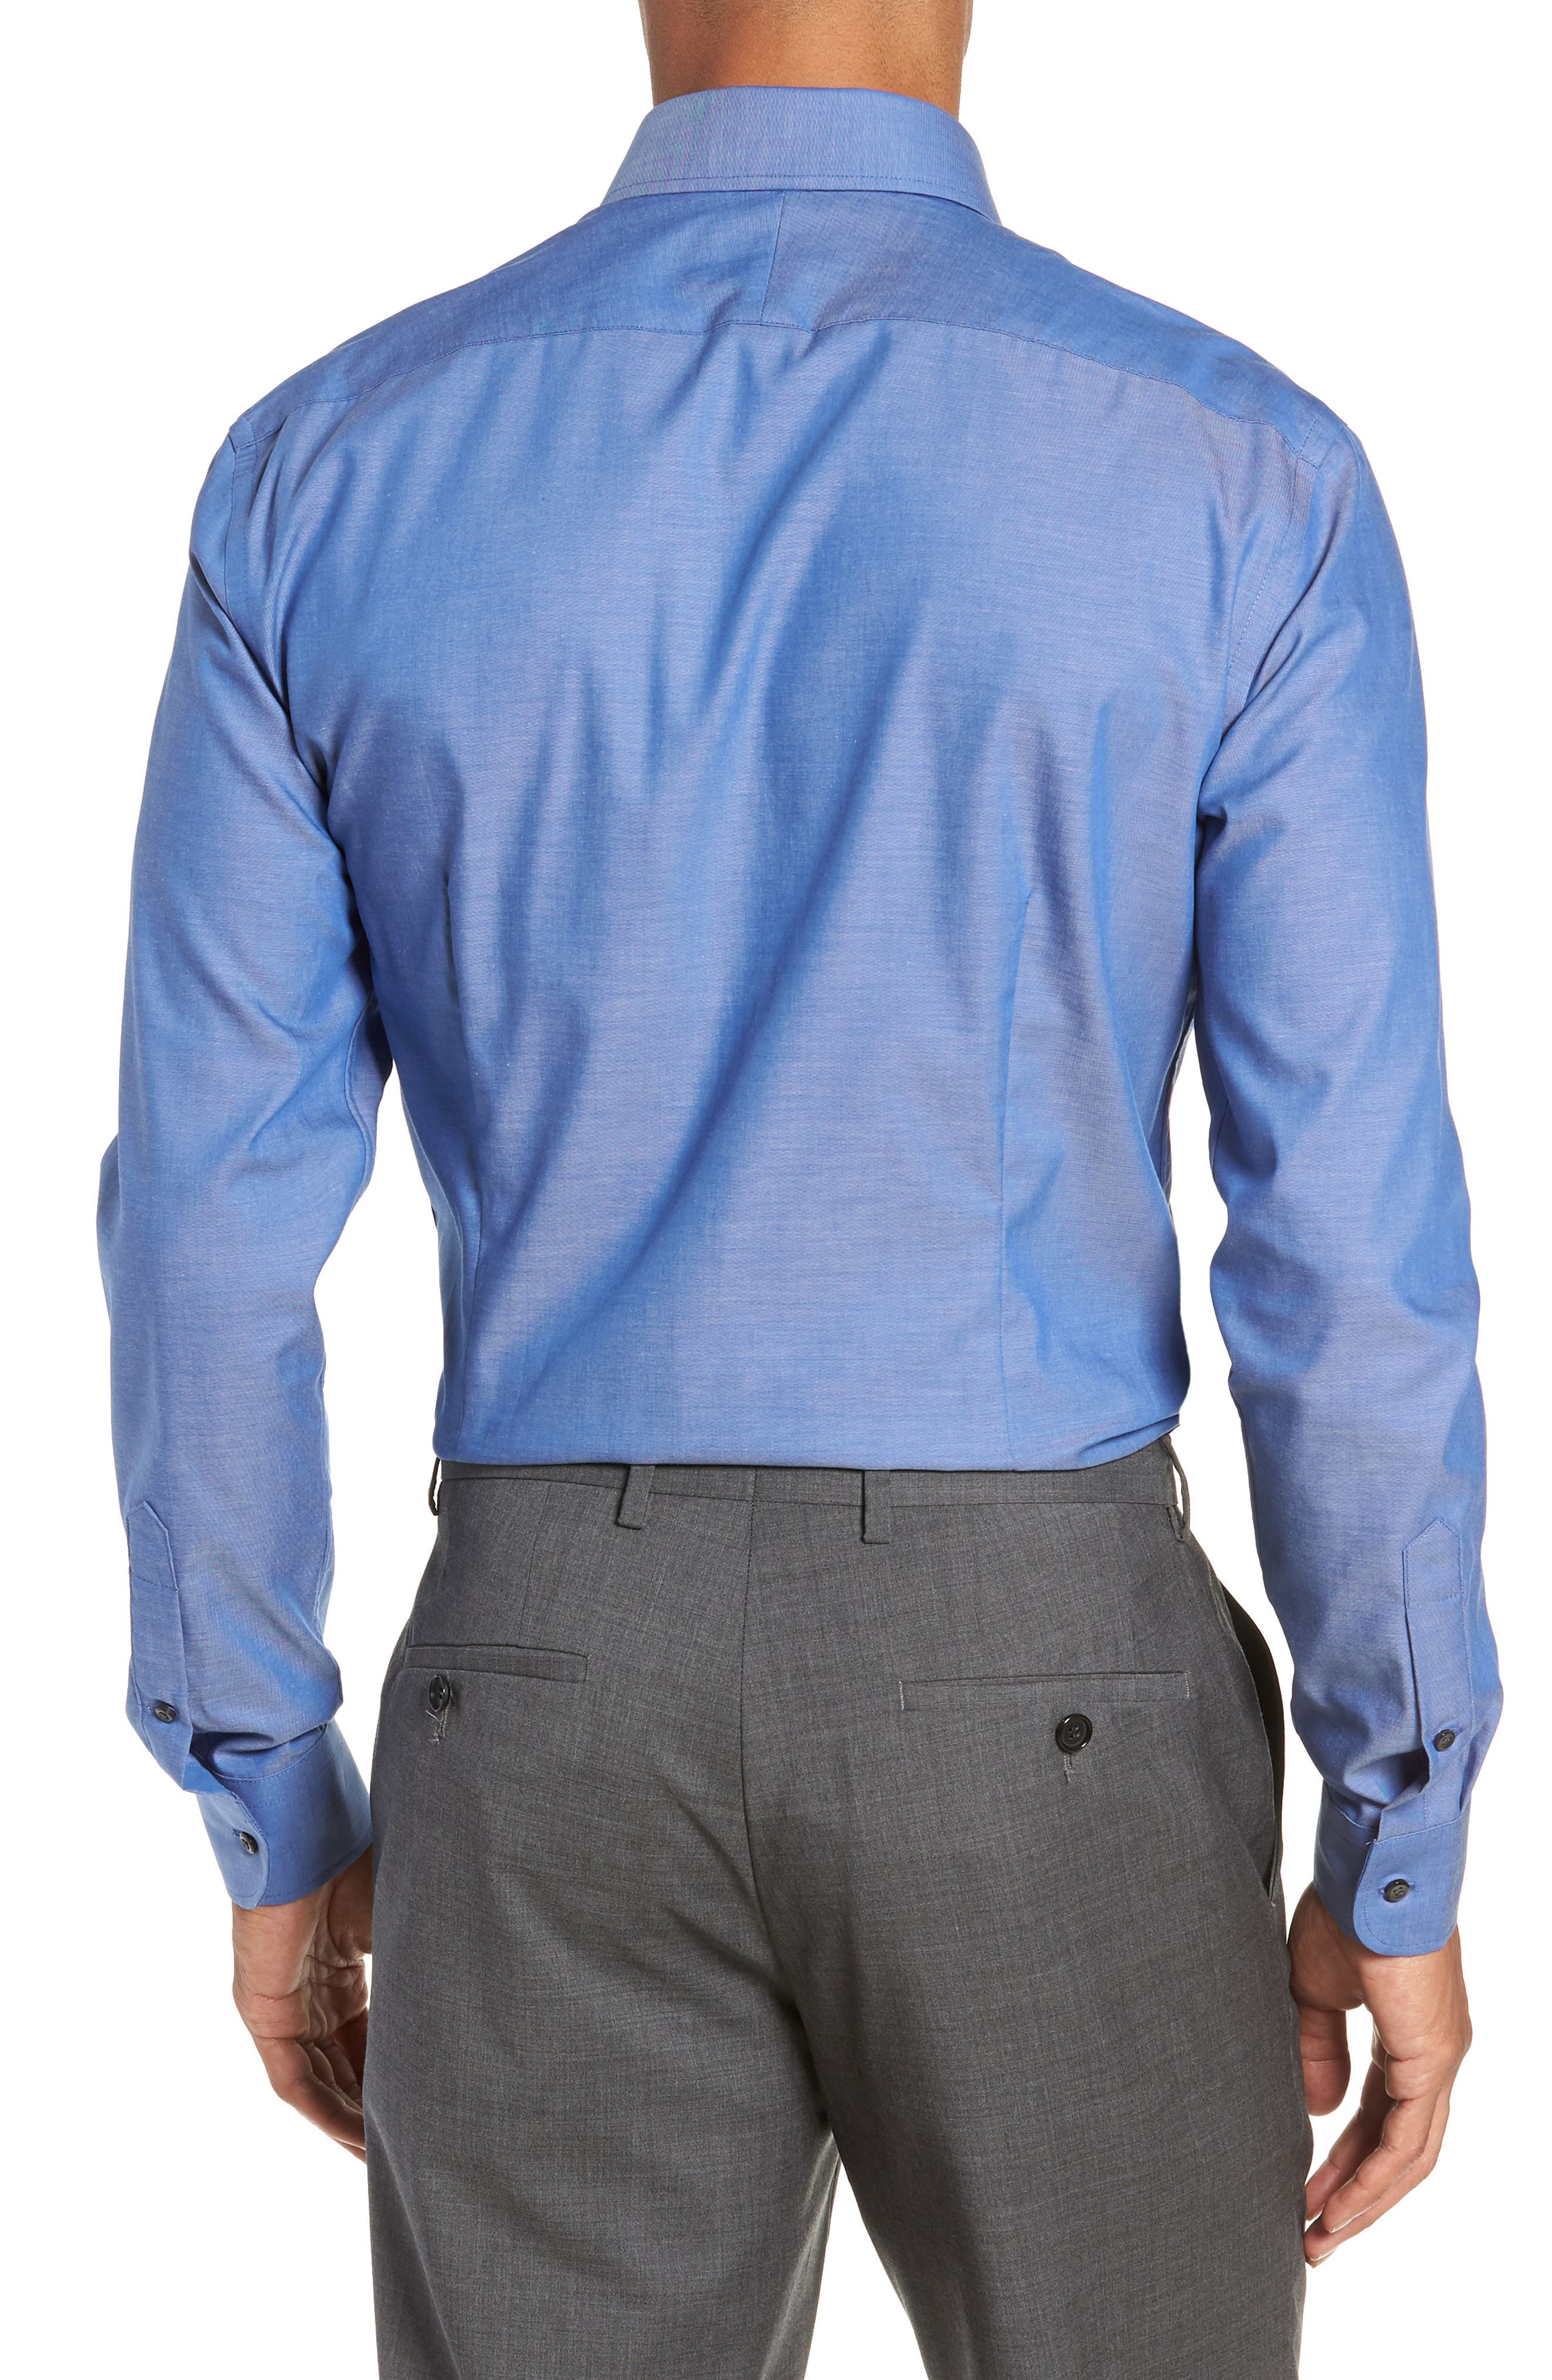 Extra Trim Fit Non-Iron Solid Dress Shirt,                             Alternate thumbnail 3, color,                             BLUE DENIM